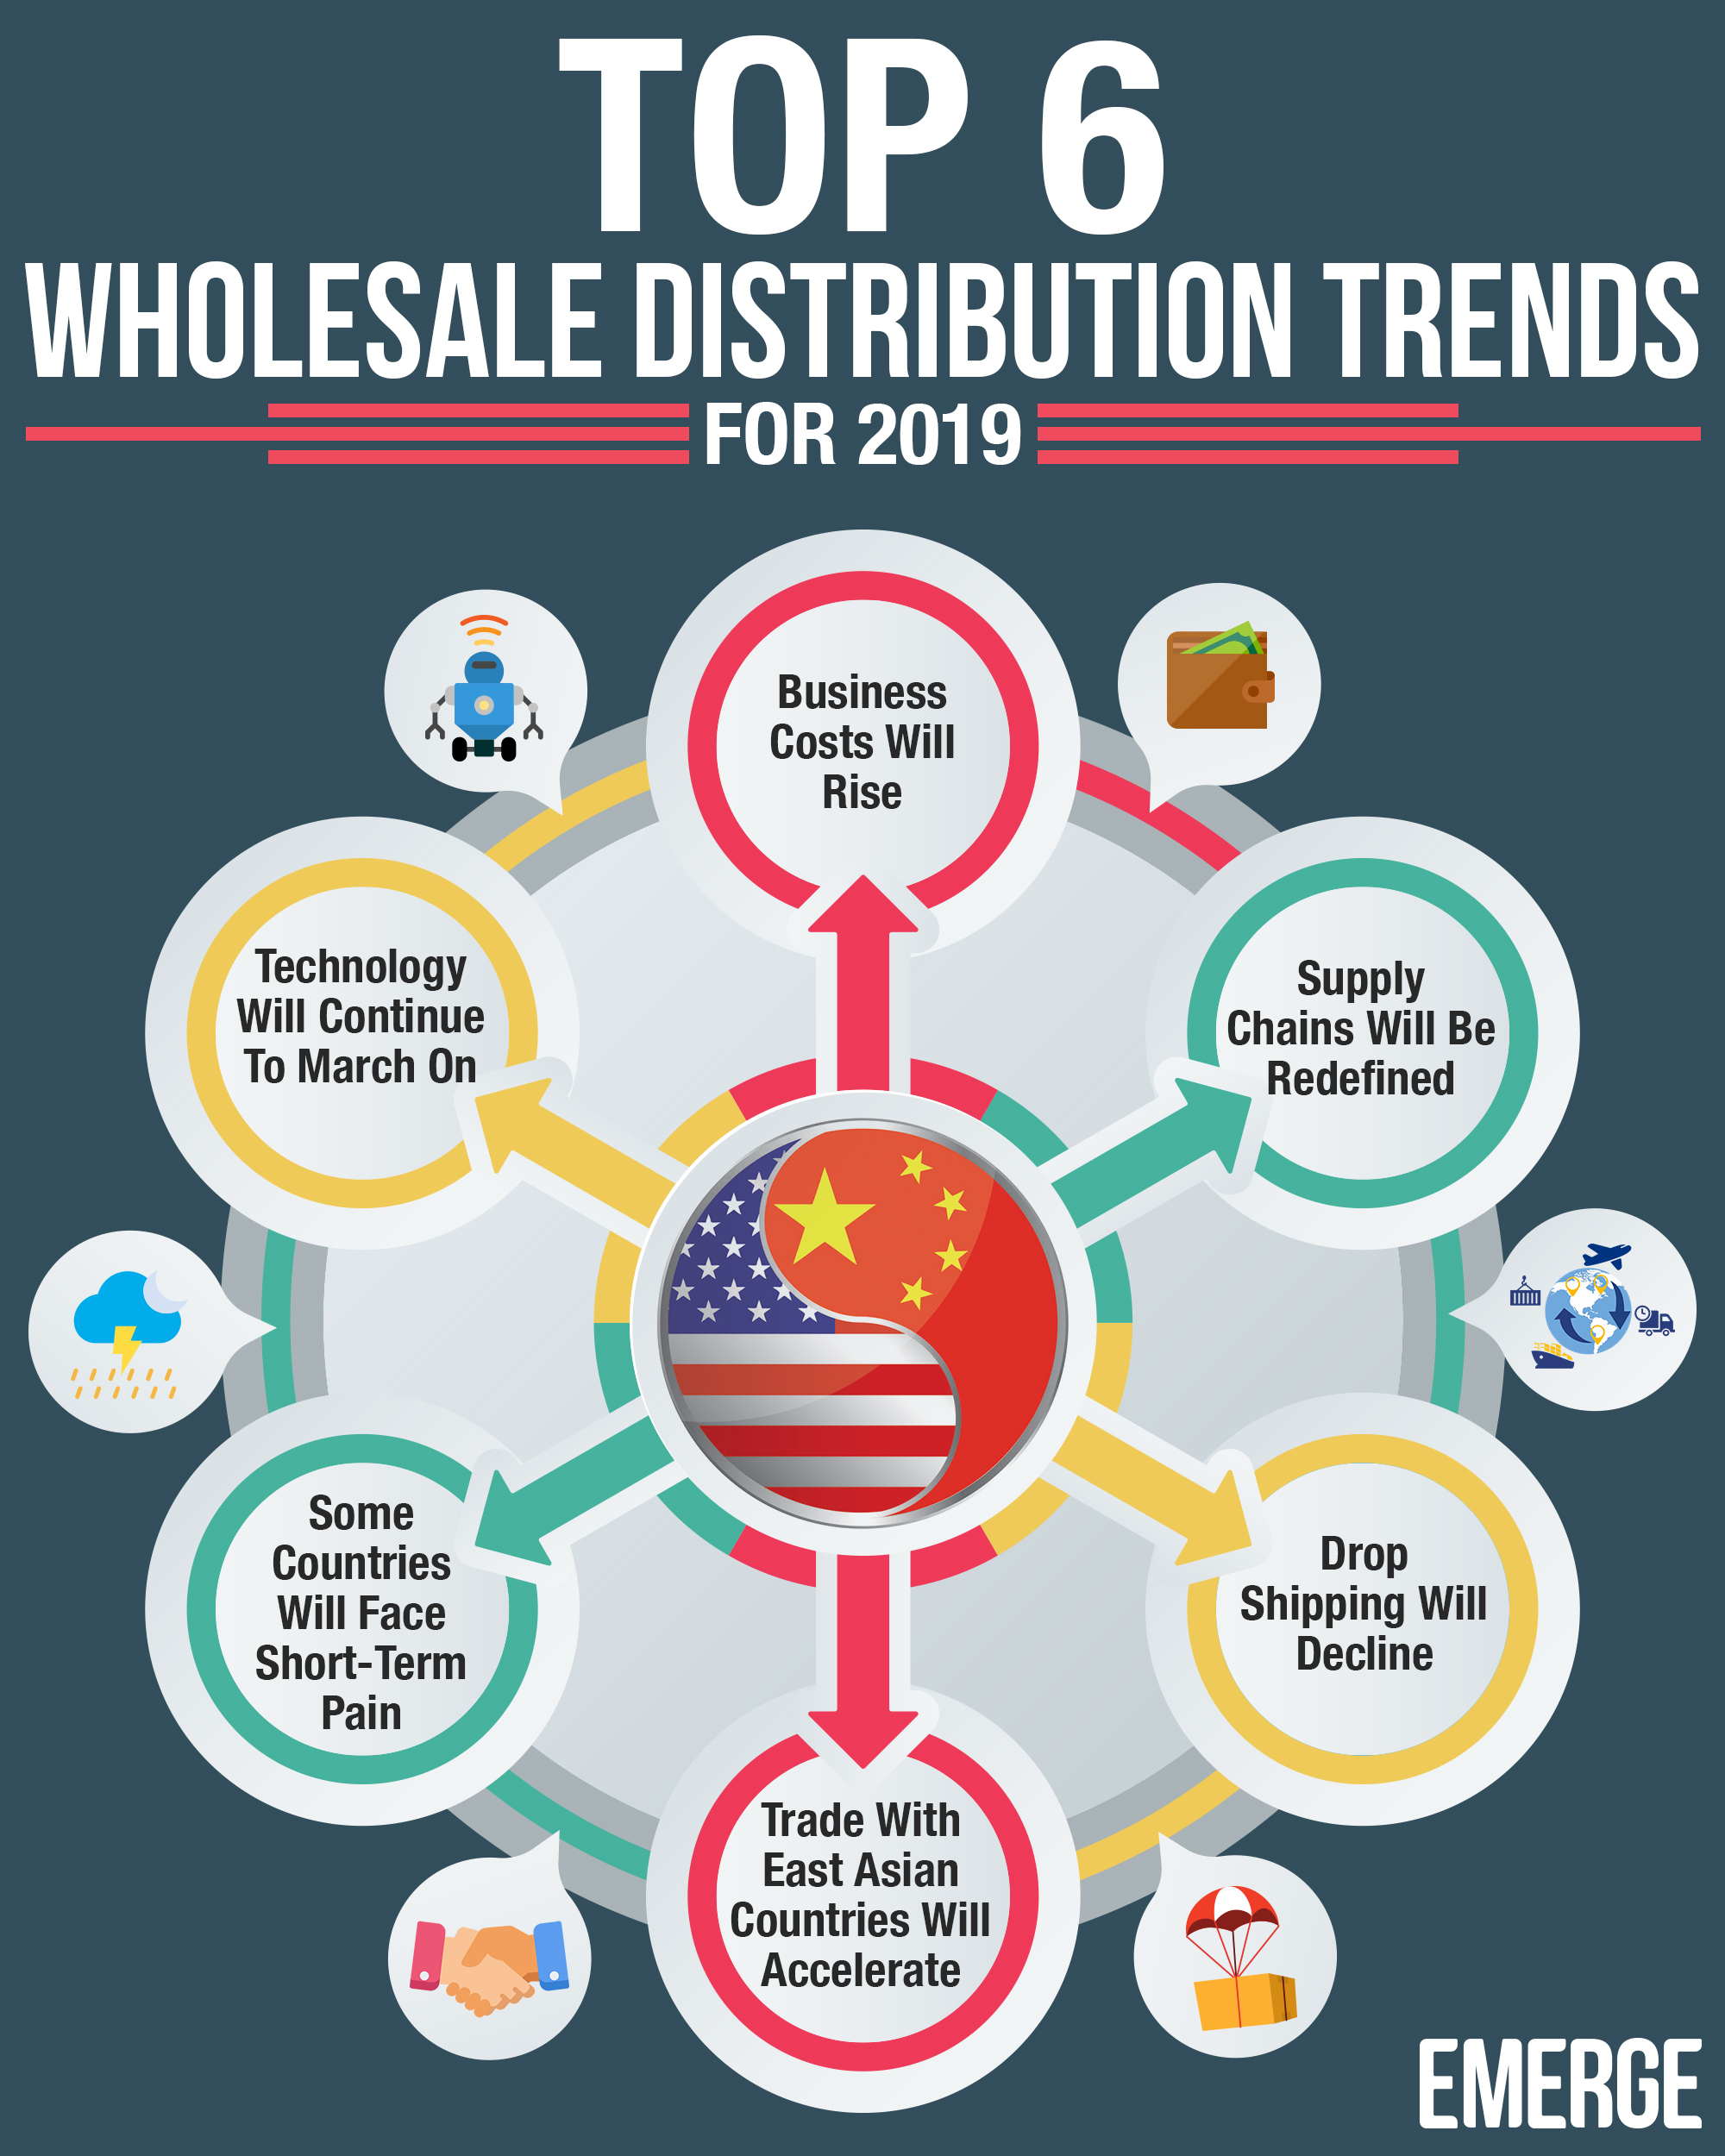 66cfa4c10cca Top 6 Wholesale Distribution Trends for 2019 - EMERGE App